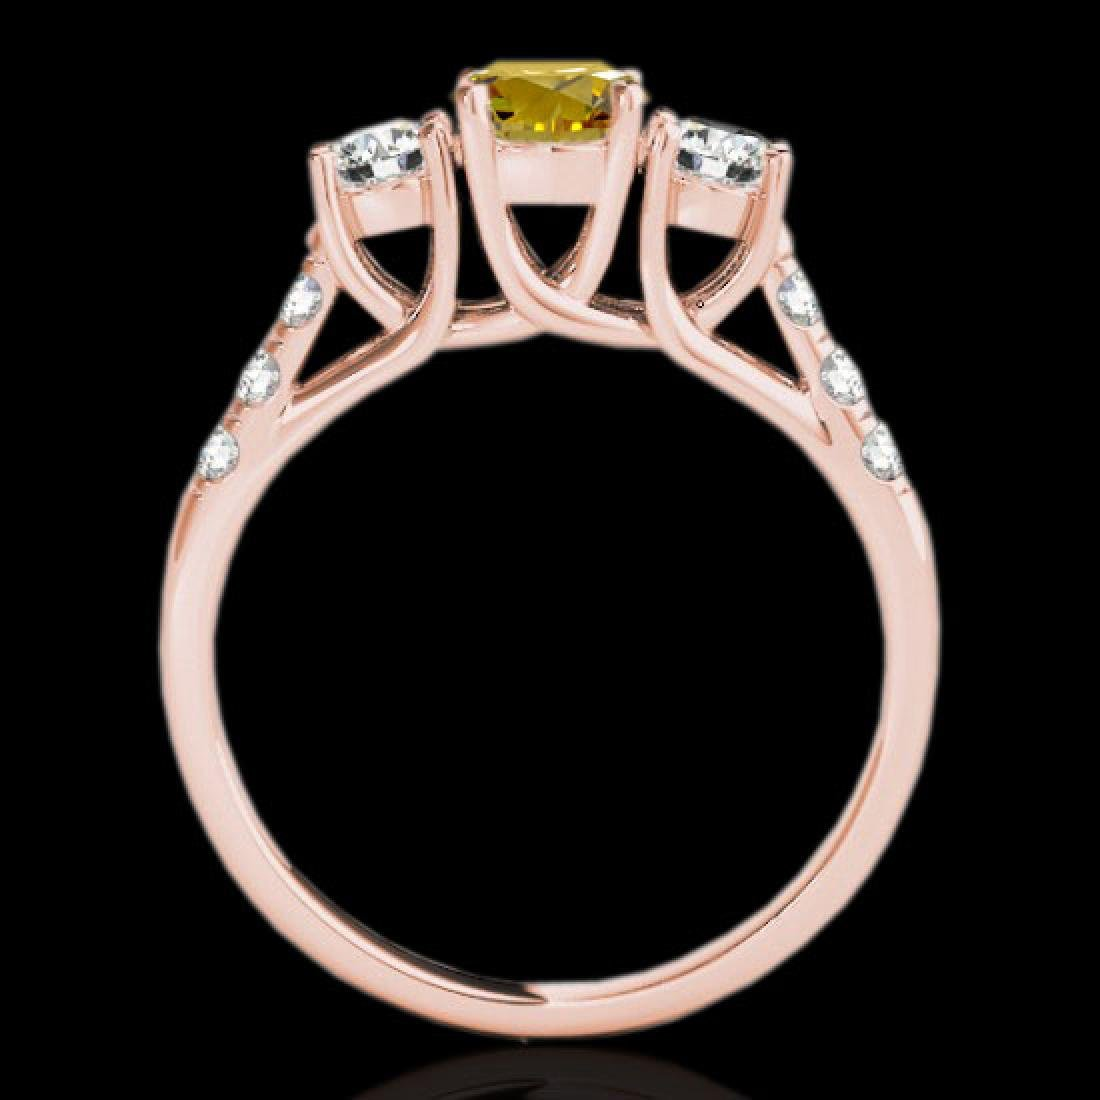 3.25 CTW Certified Si Fancy Intense Yellow Diamond 3 - 2